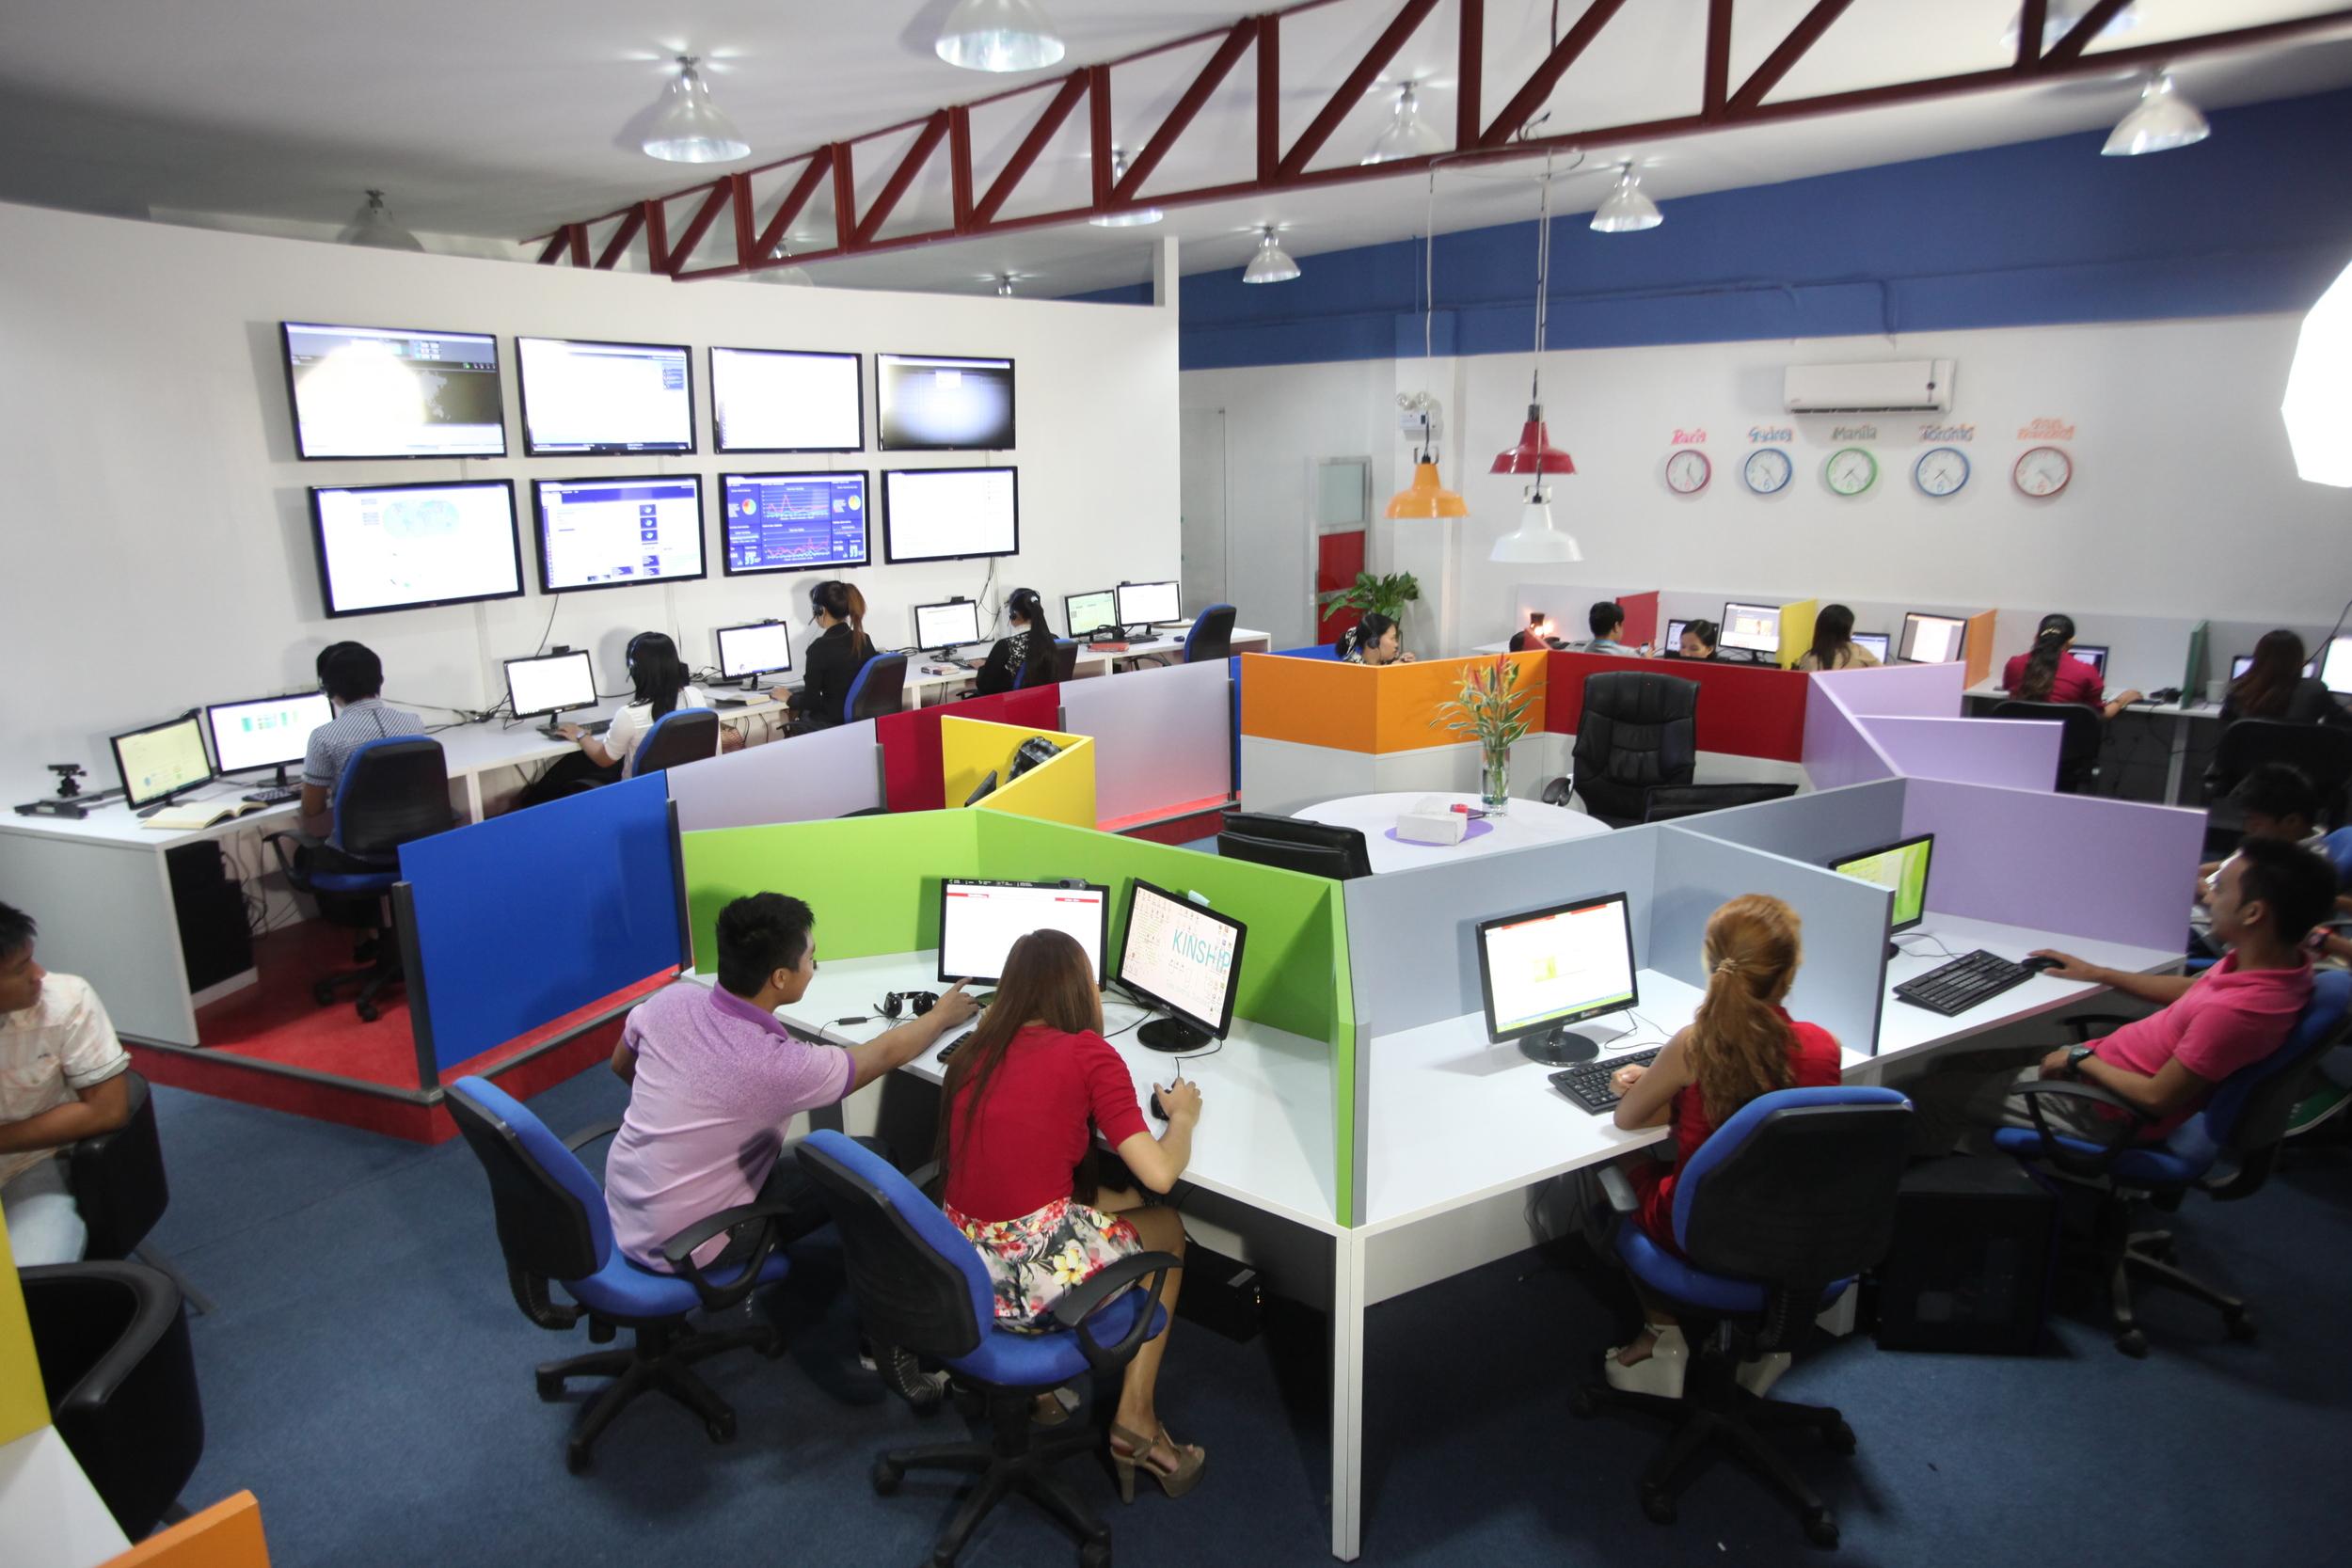 IGO2 OFFICES IN THE PHILIPPINES.